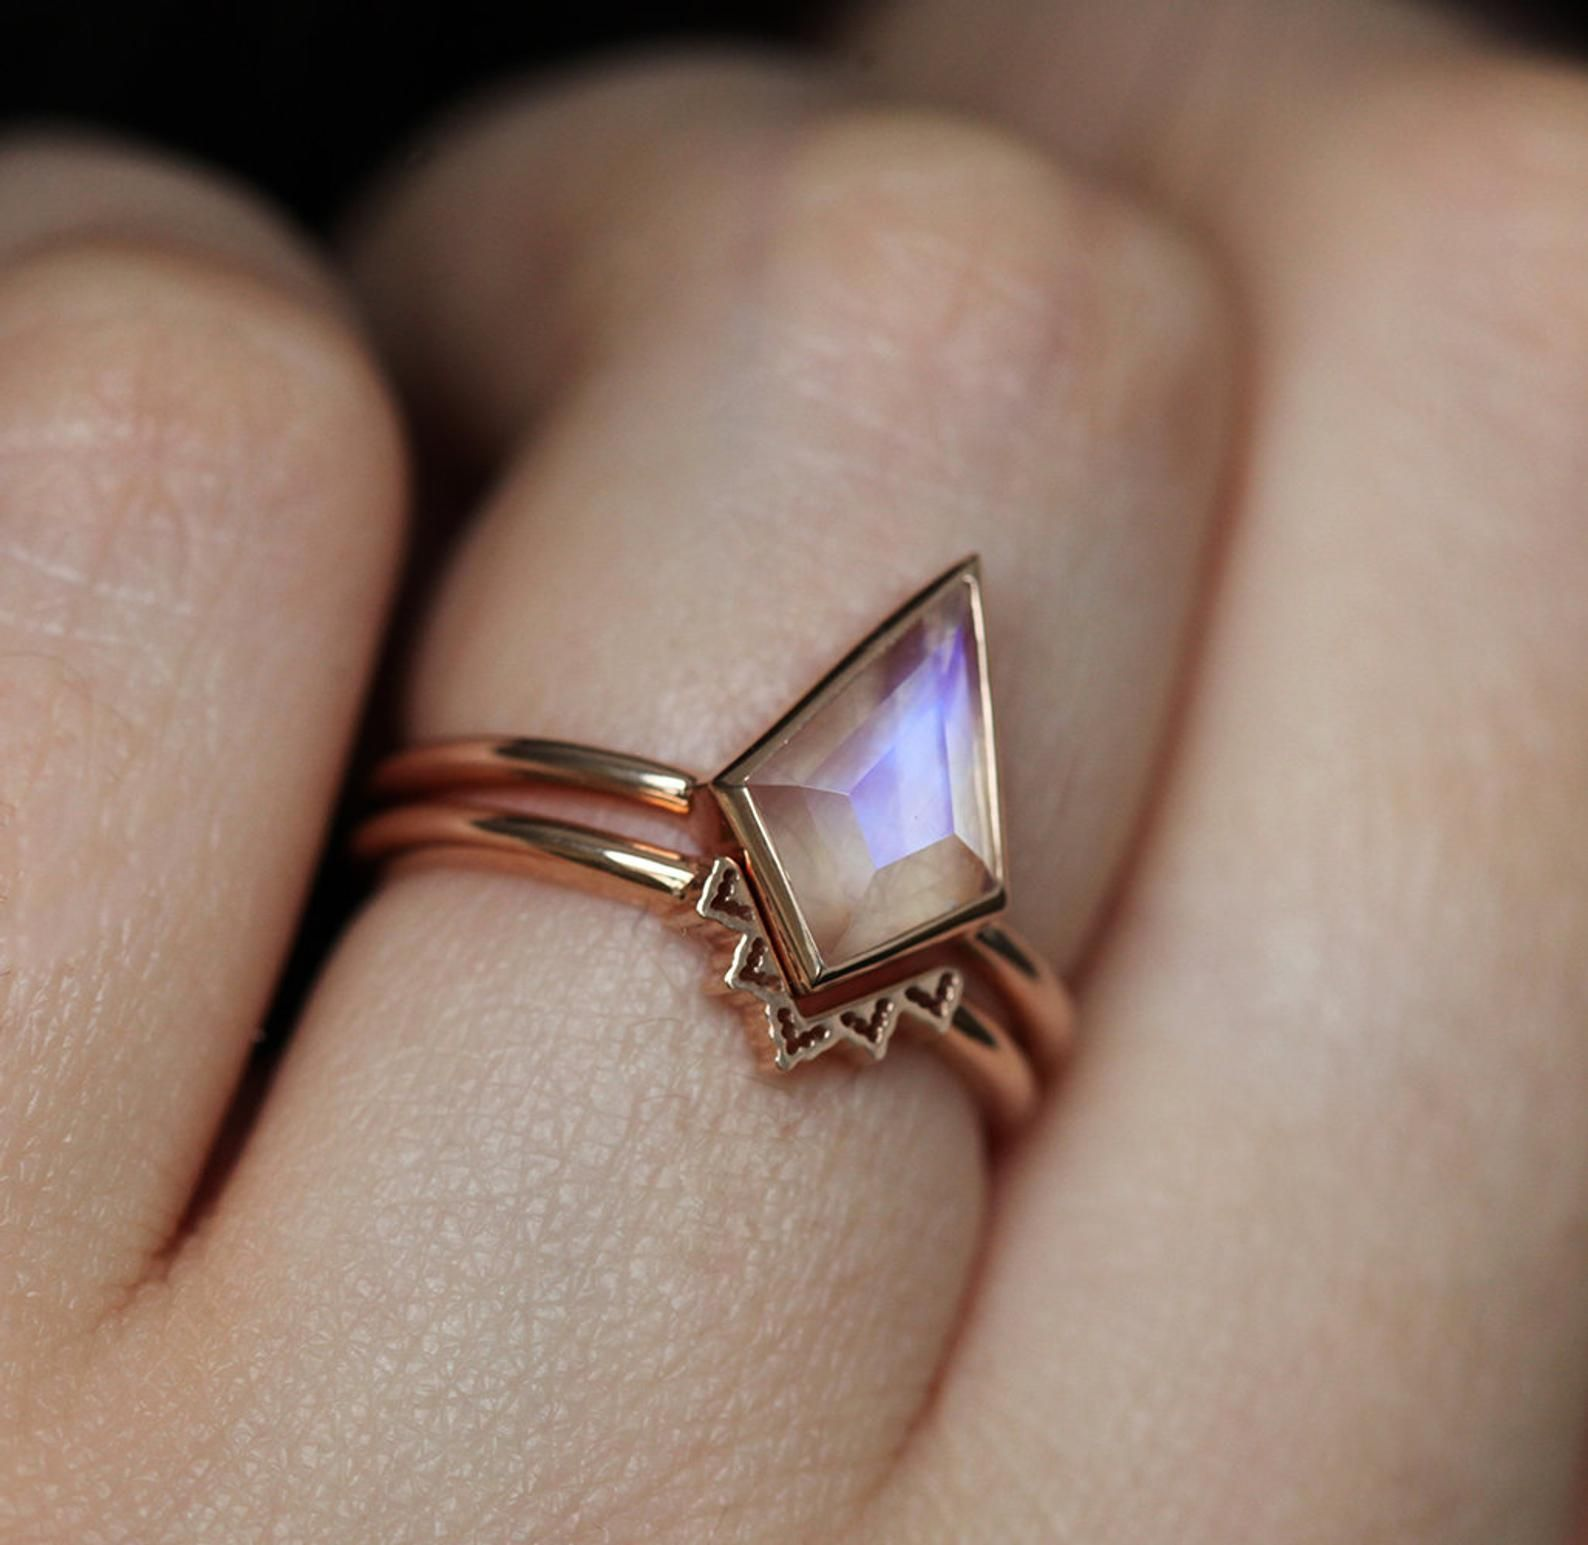 Photo of Blue Moonstone Ring, Kite Moonstone Engagement Ring, Geometric Moonstone Ring Rainbow Rose Gold, Moonstone Solitaire